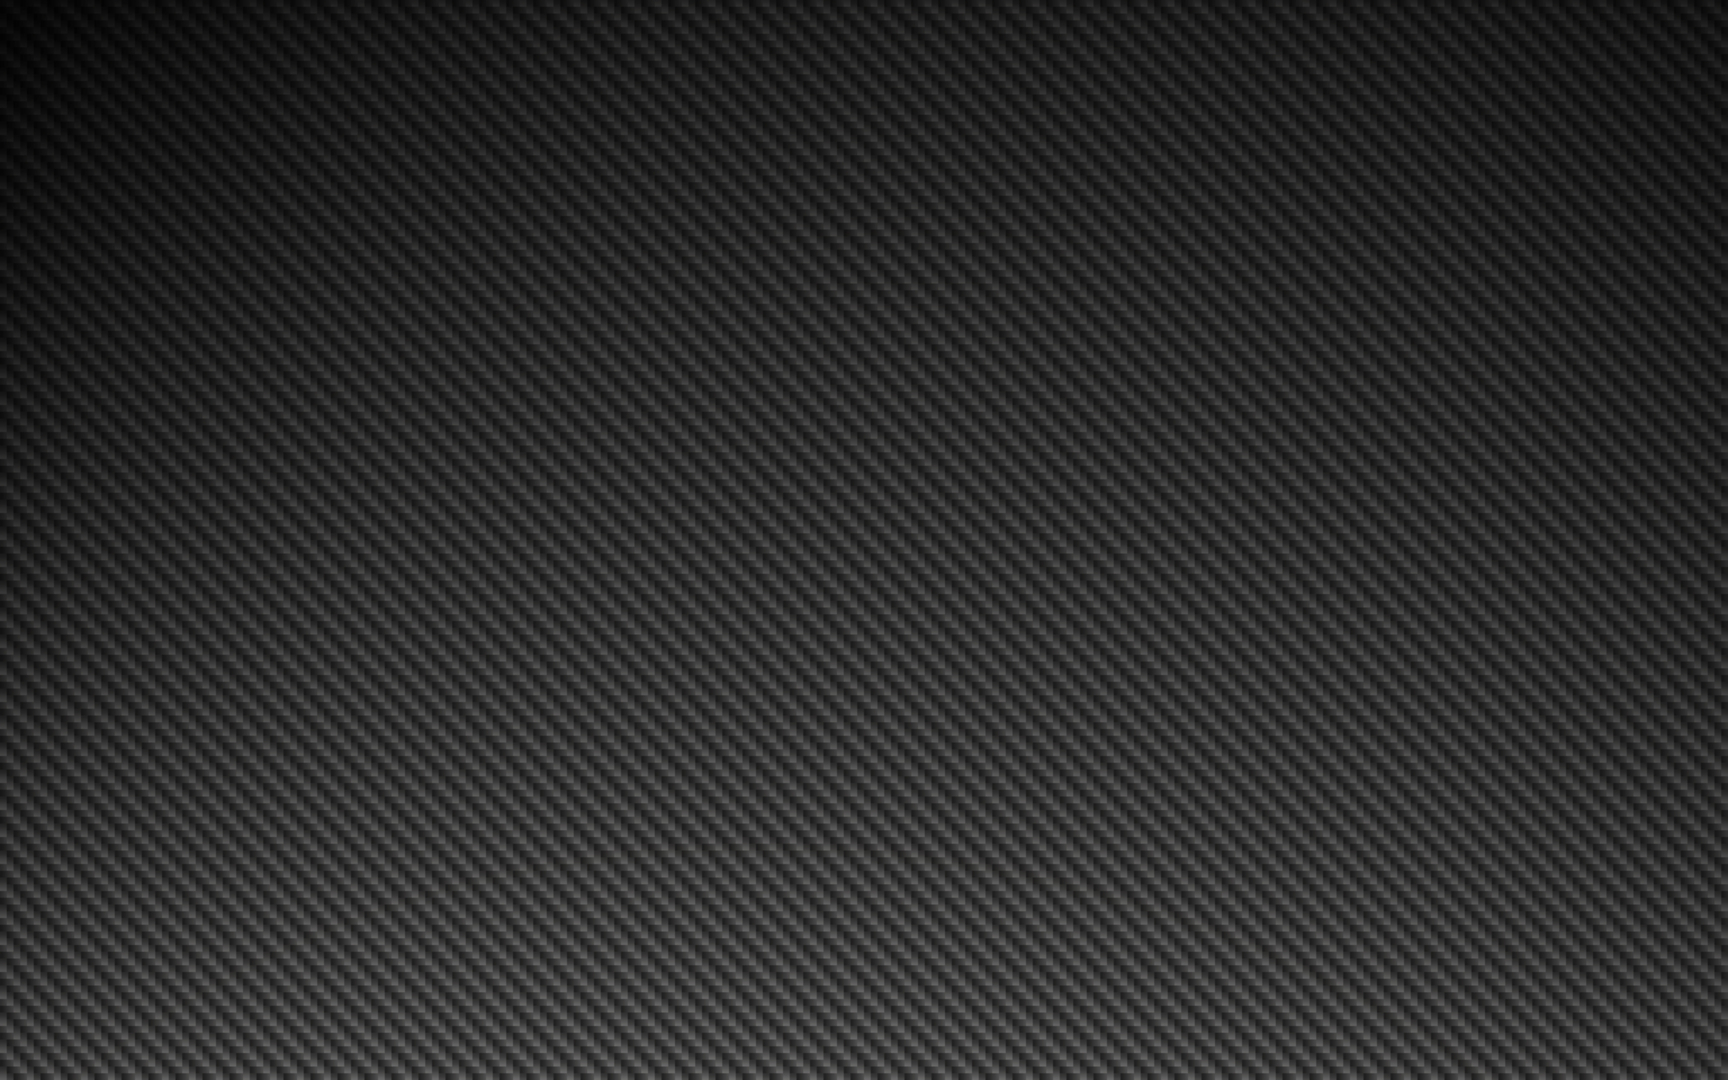 Carbon Fiber Wallpaper 1920x1080 - WallpaperSafari